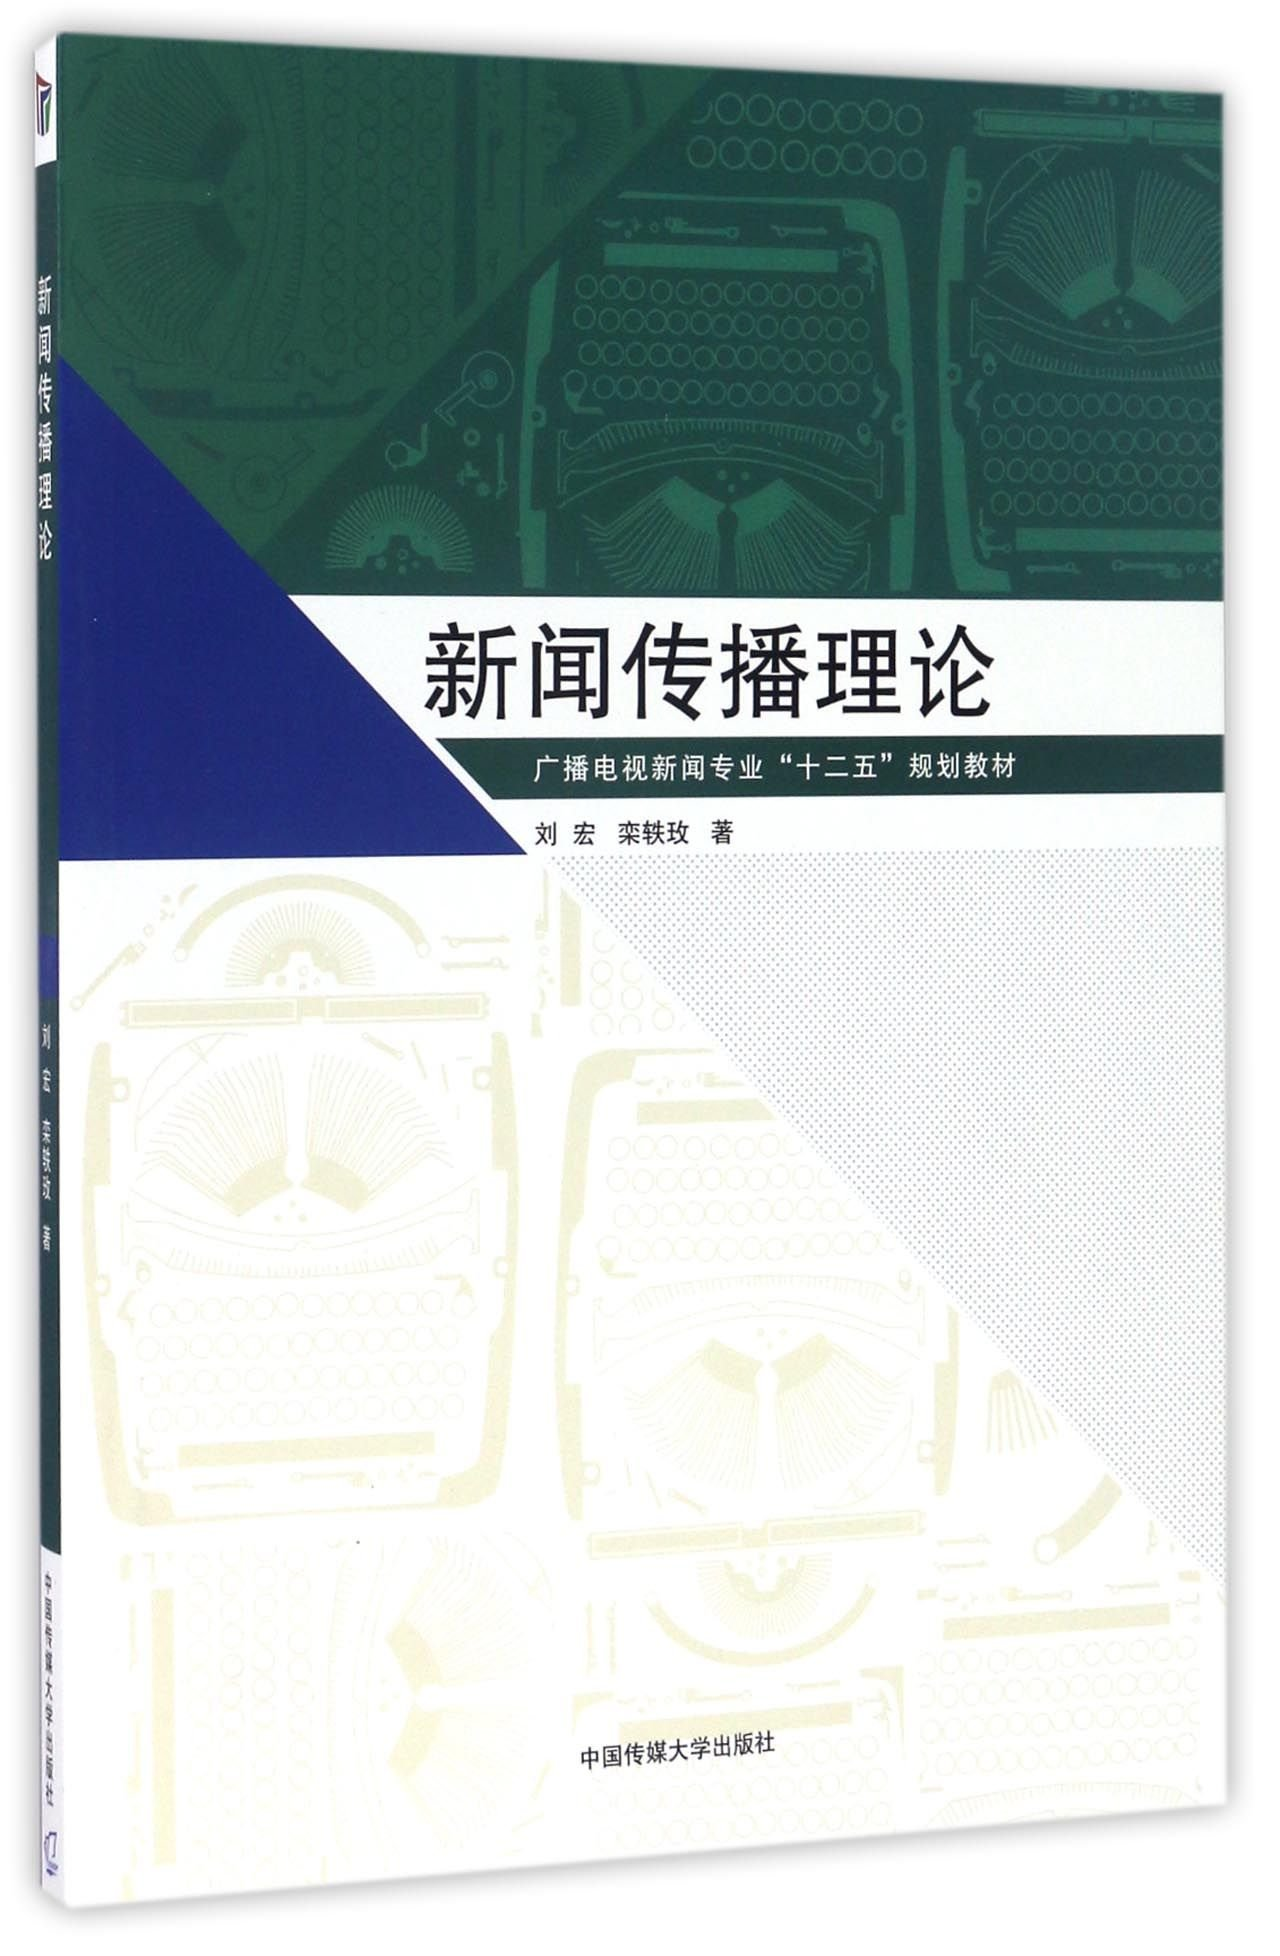 Download 新闻传播理论(广播电视新闻专业十二五规划教材) PDF